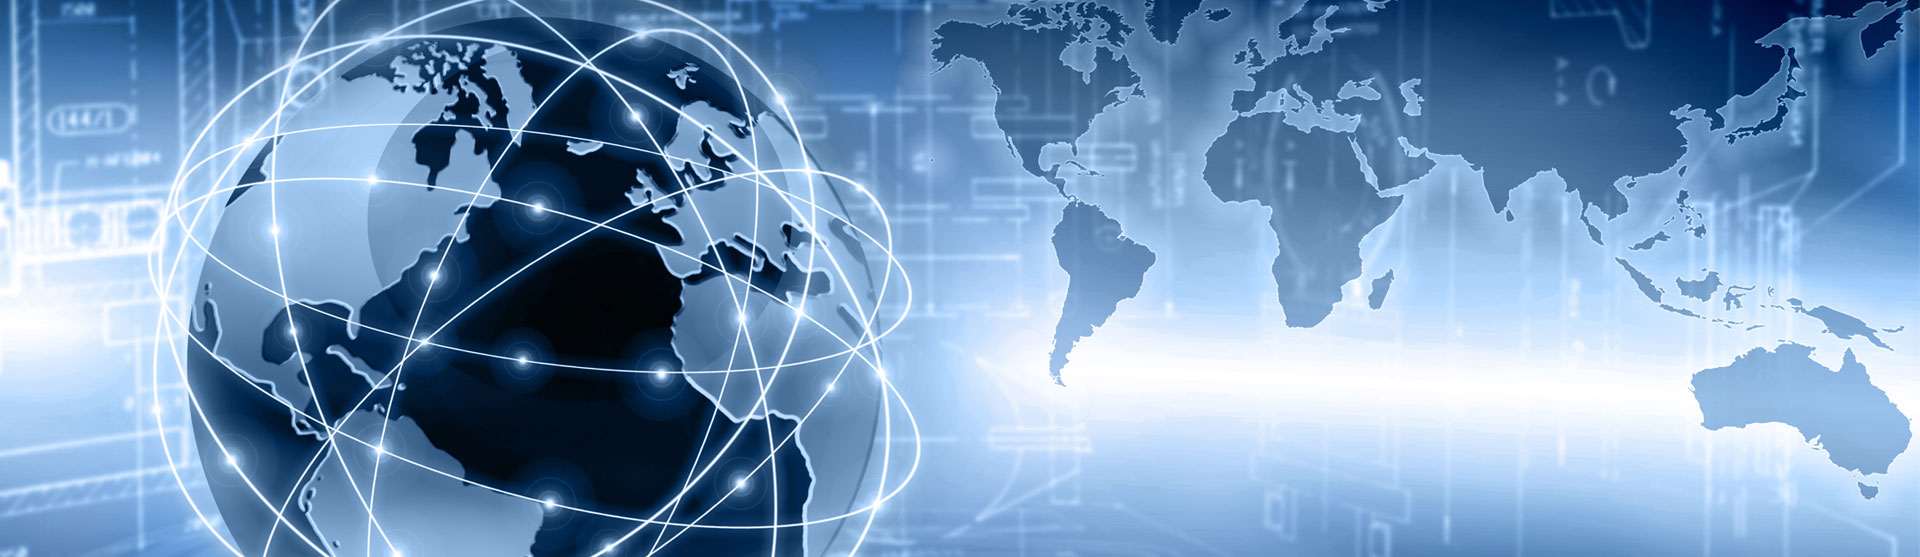 Soluciones para un mundo global